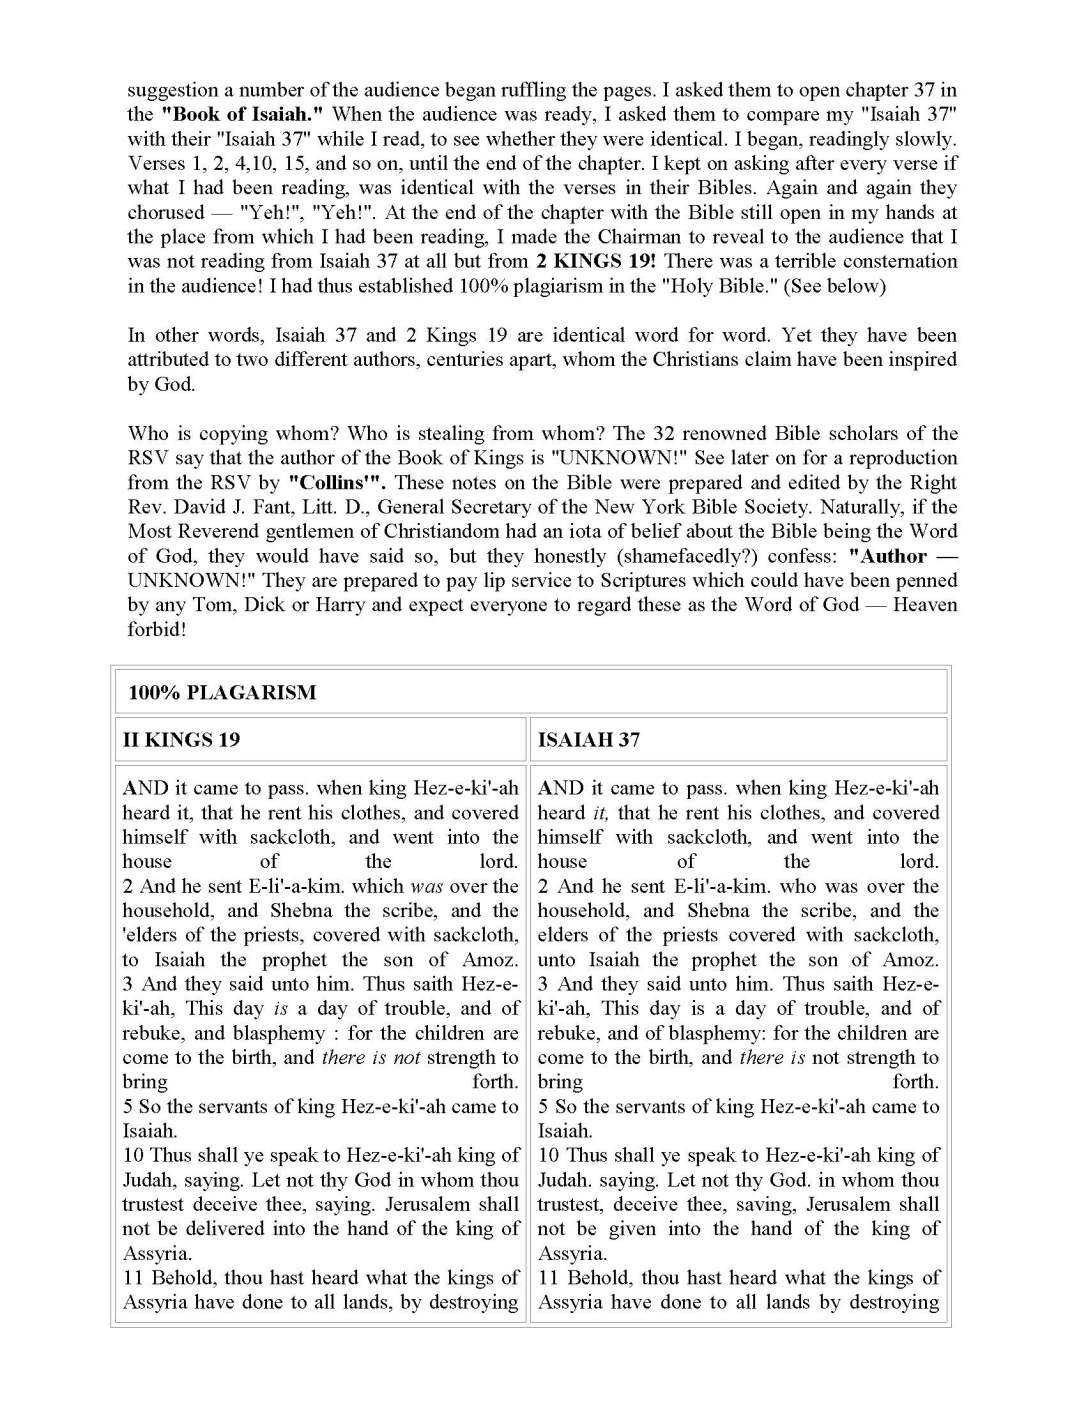 Is The Bible Gods Word [deedat]_Page_24